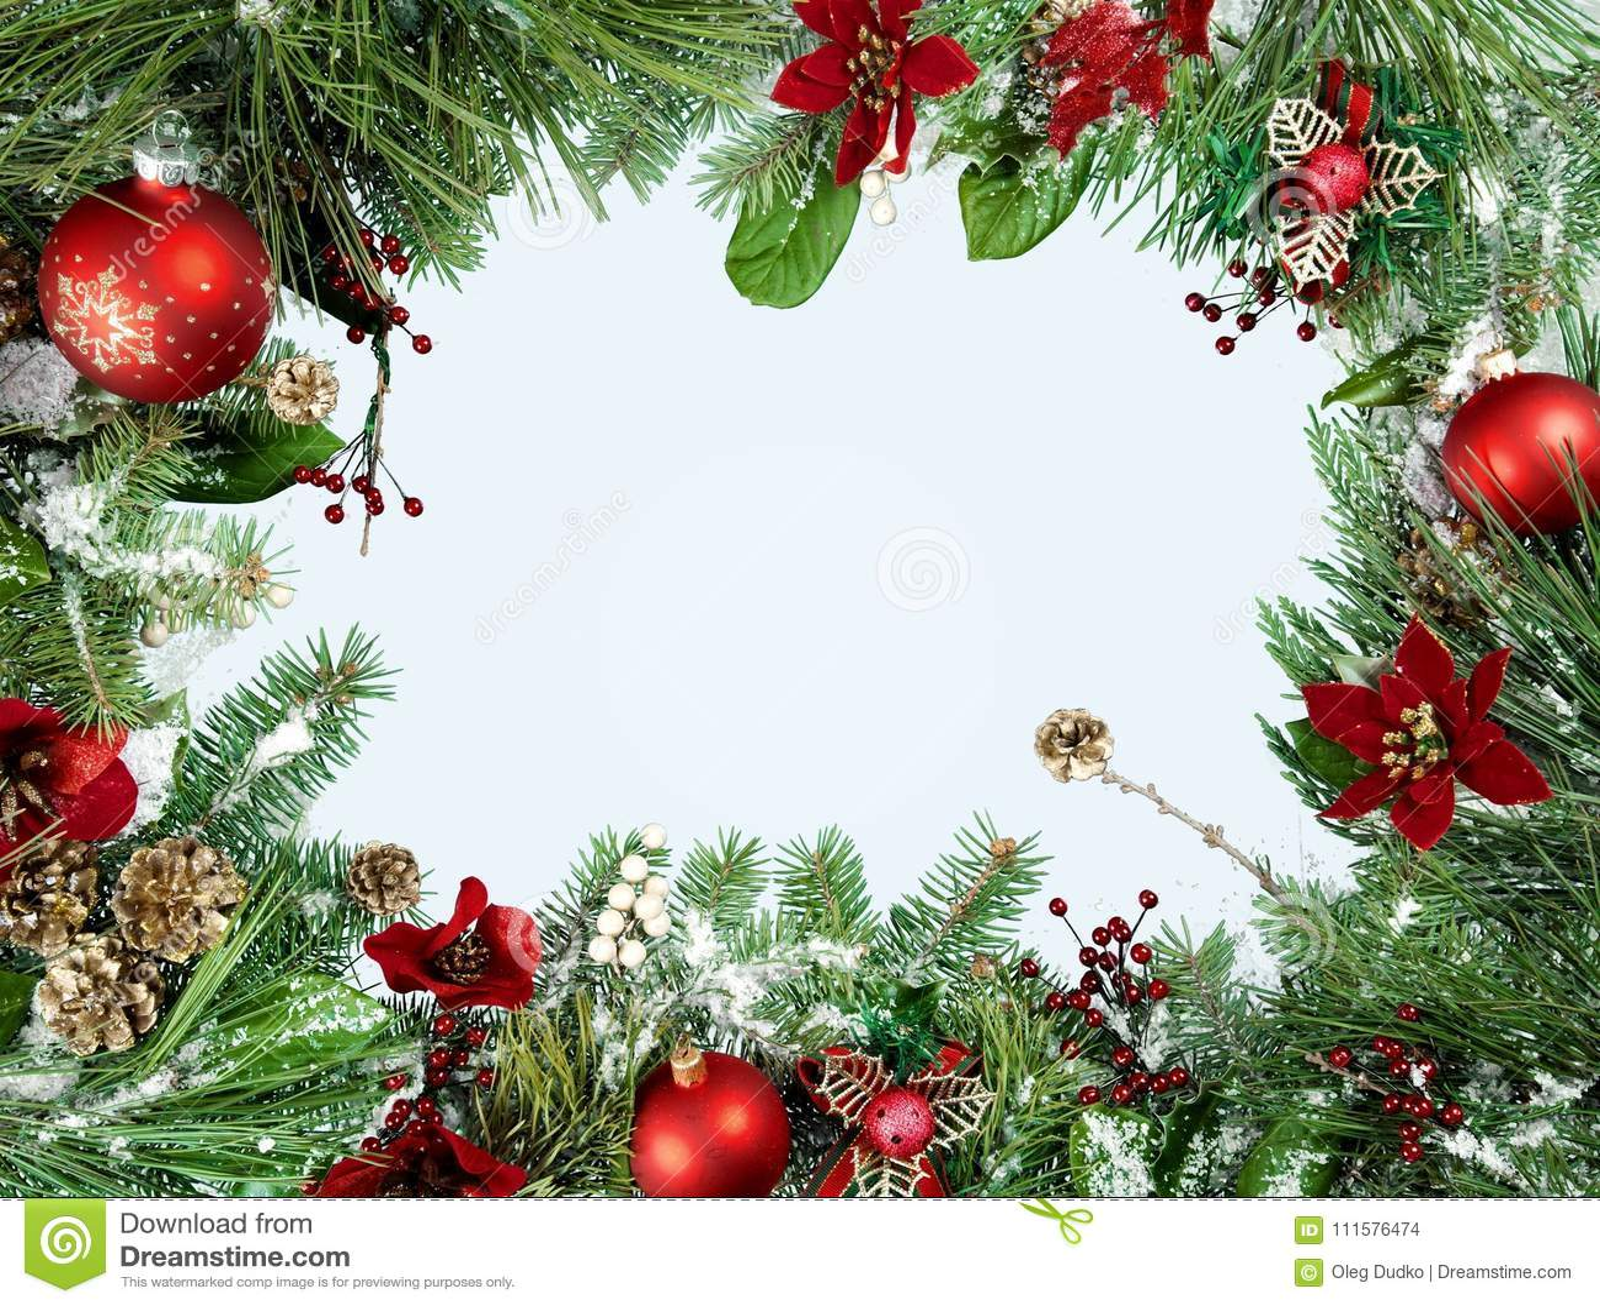 Beautiful Christmas Decorations On Background Stock Photo Image Of